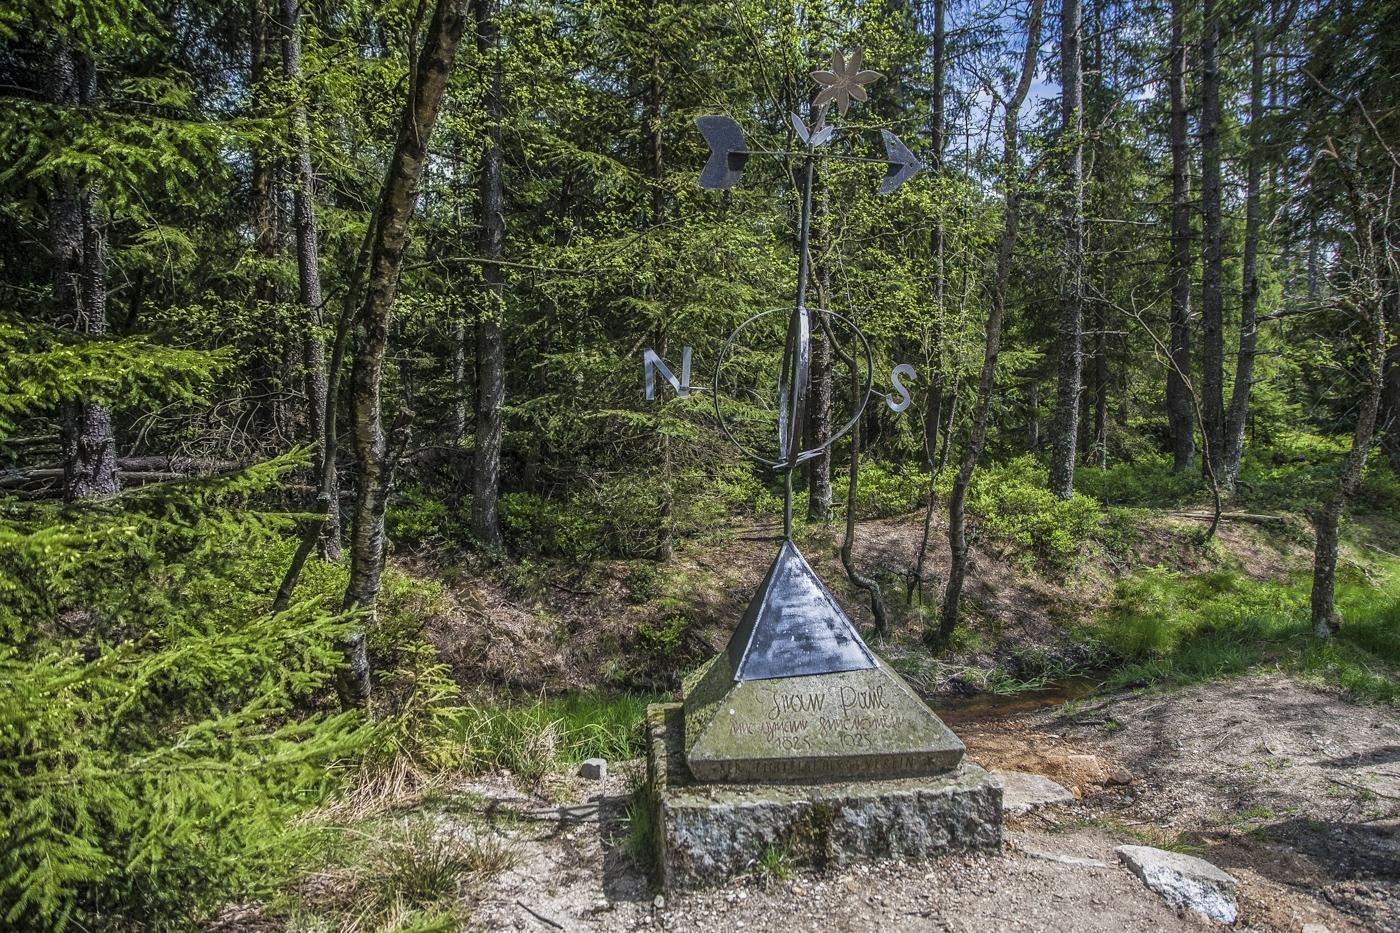 Jean-Paul-Wanderweg Fichtelgebirge